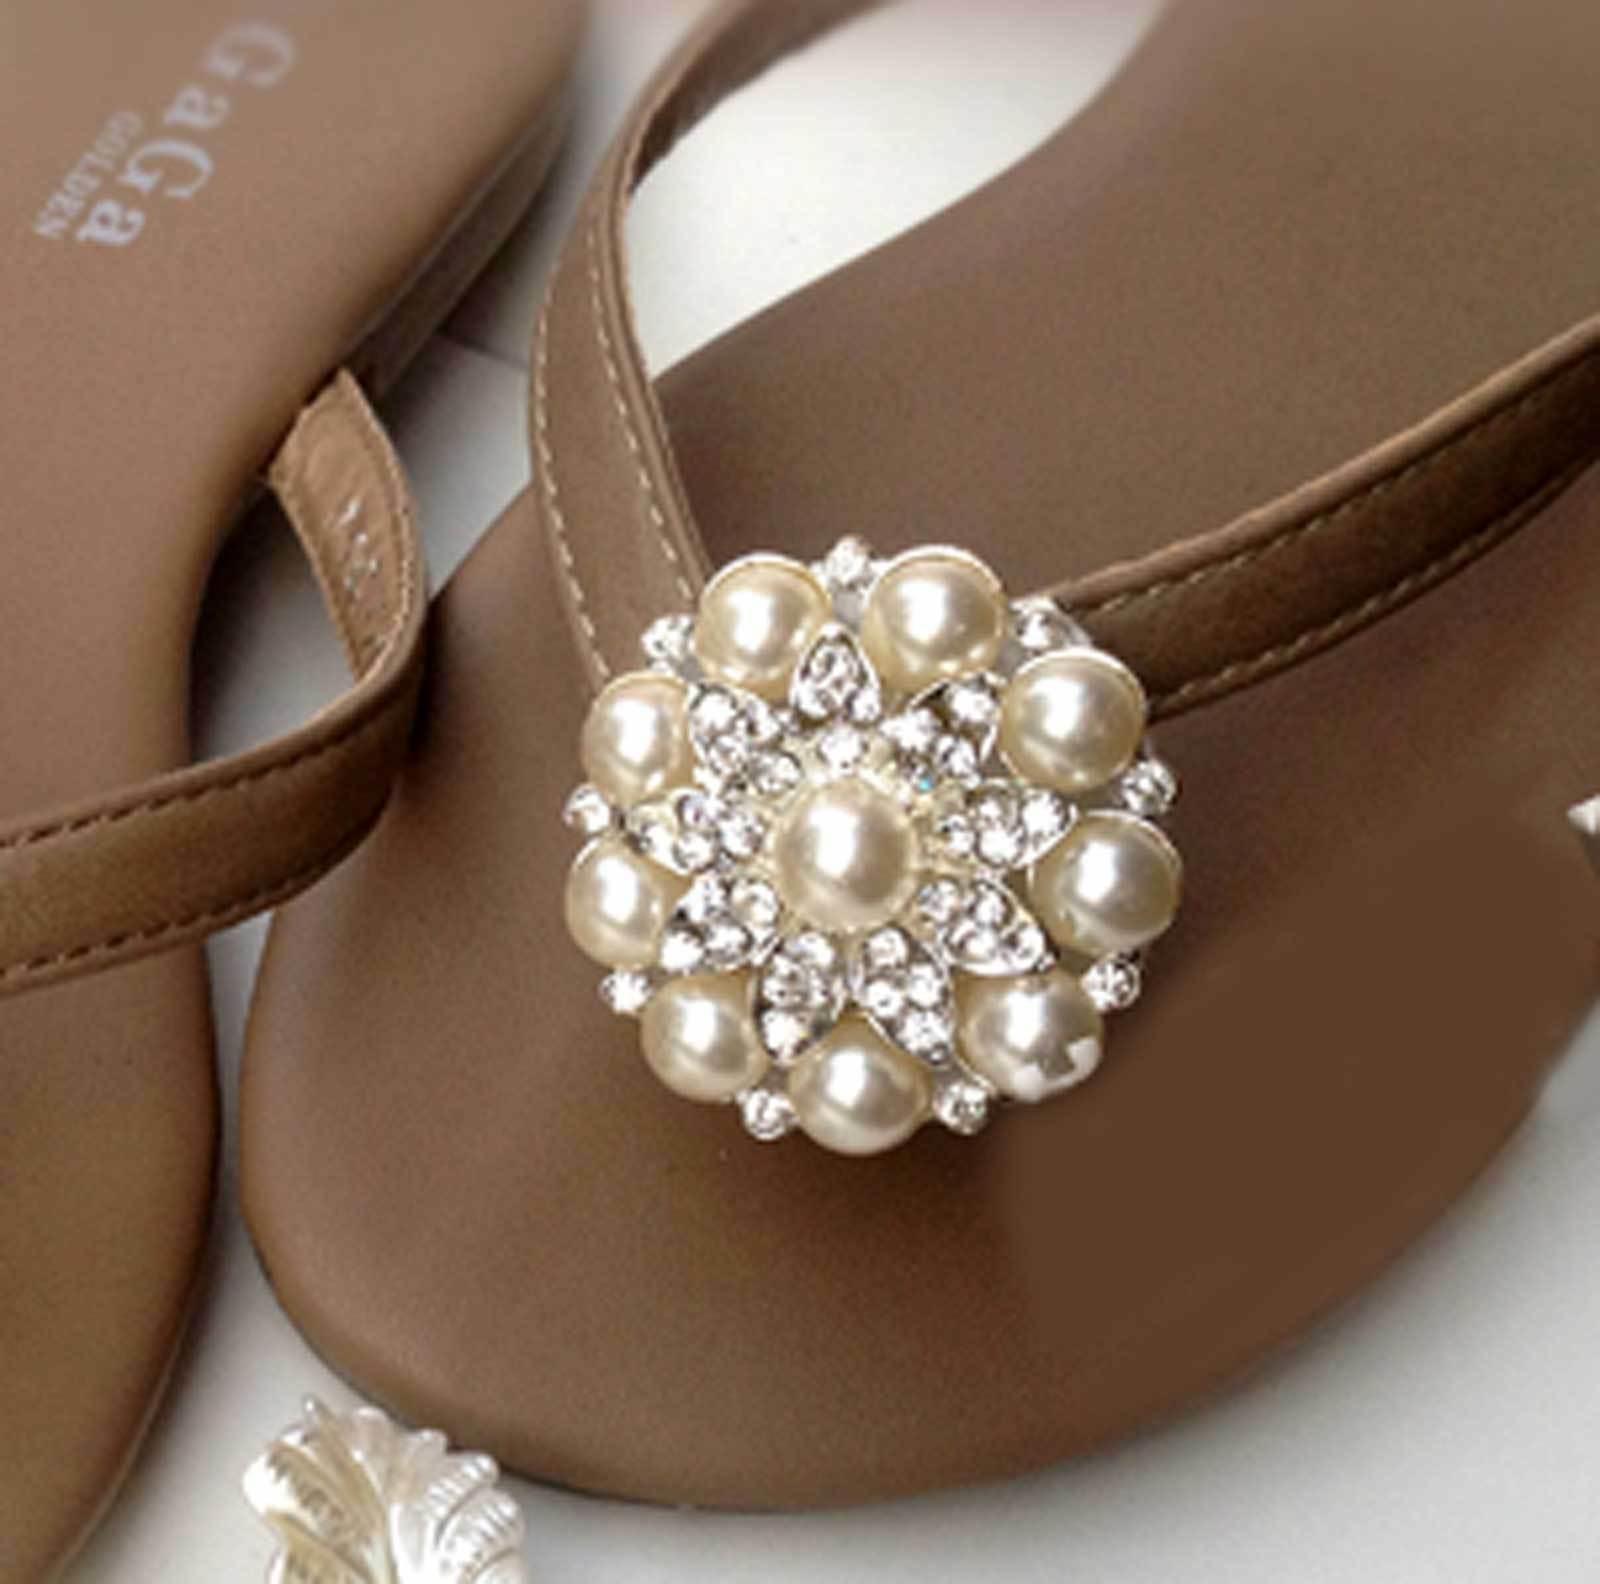 2 Pcs Wedding Crystal Pearl Flower Shoes Flip Flop Slippers Sandals Shoe Clips